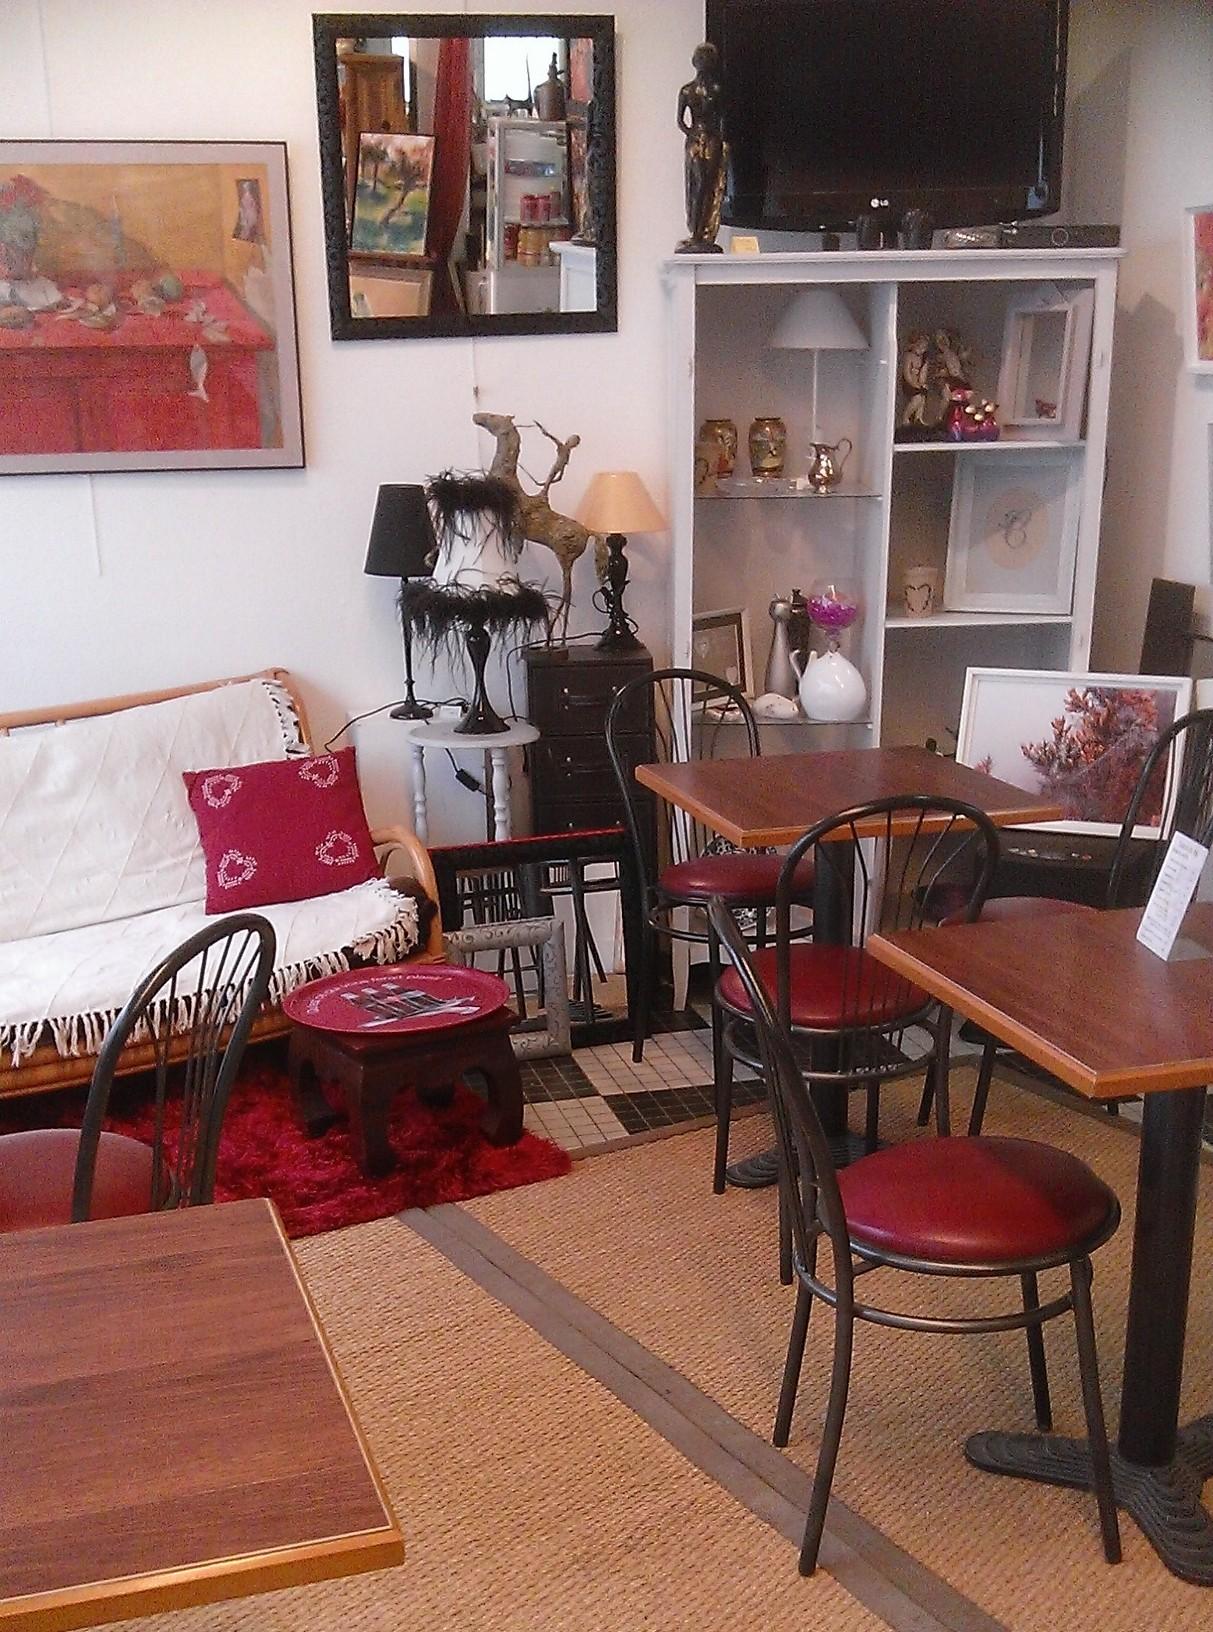 salon de th brocante centre ville de caen. Black Bedroom Furniture Sets. Home Design Ideas